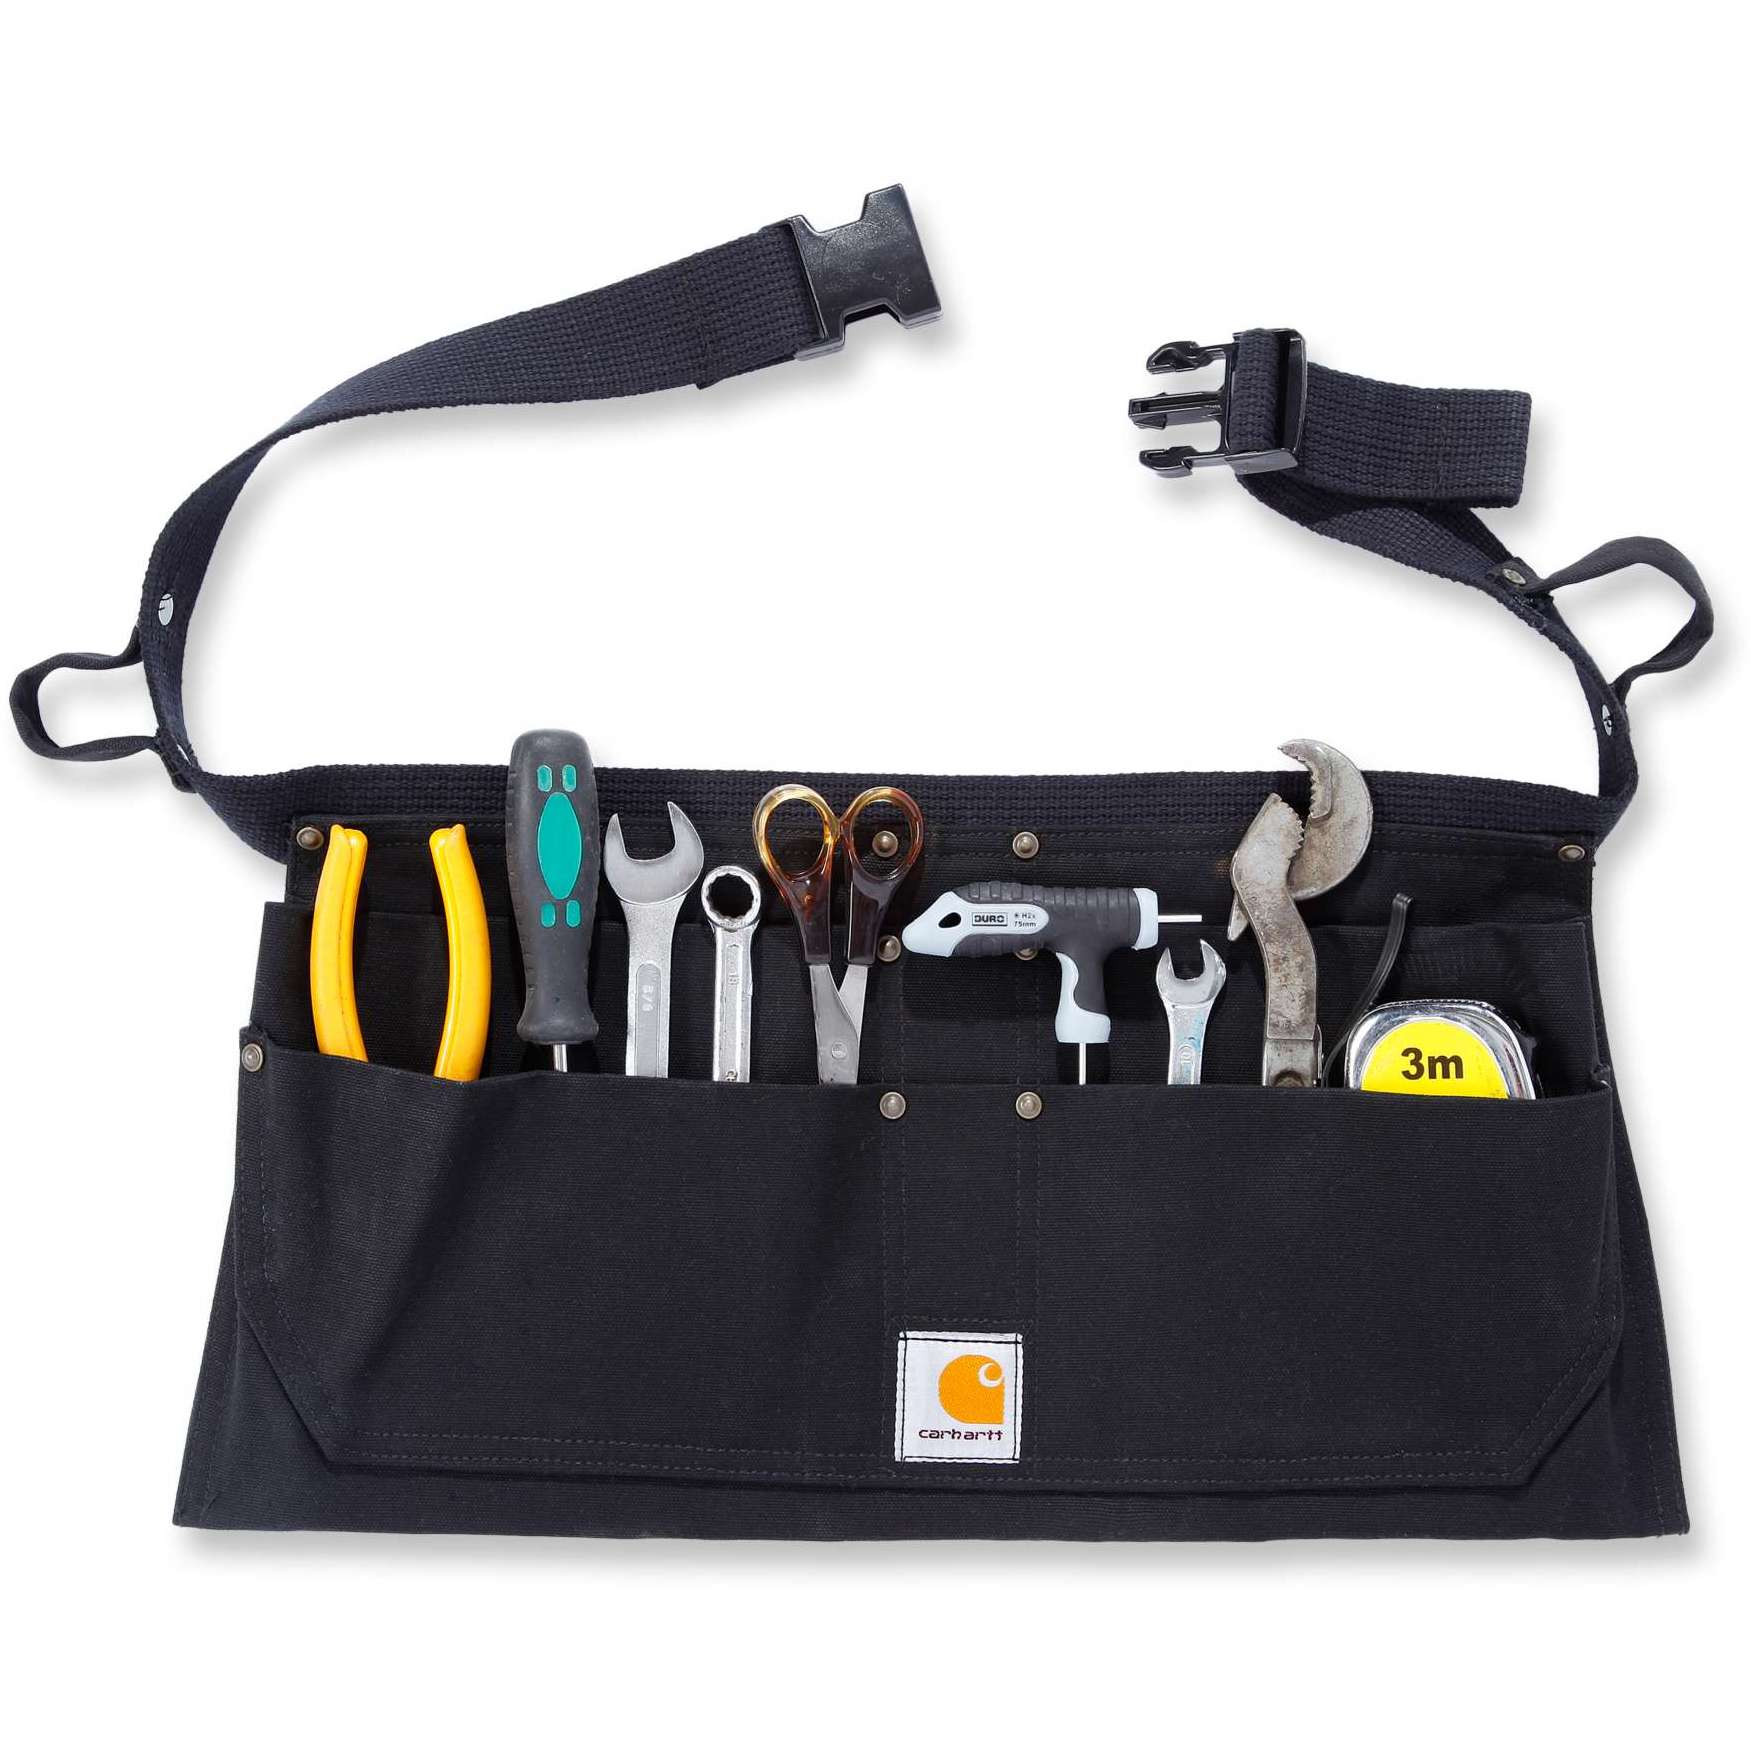 Ремень для инструментов Carhartt  Duck Tool Belt - A09 (Black, L-X)